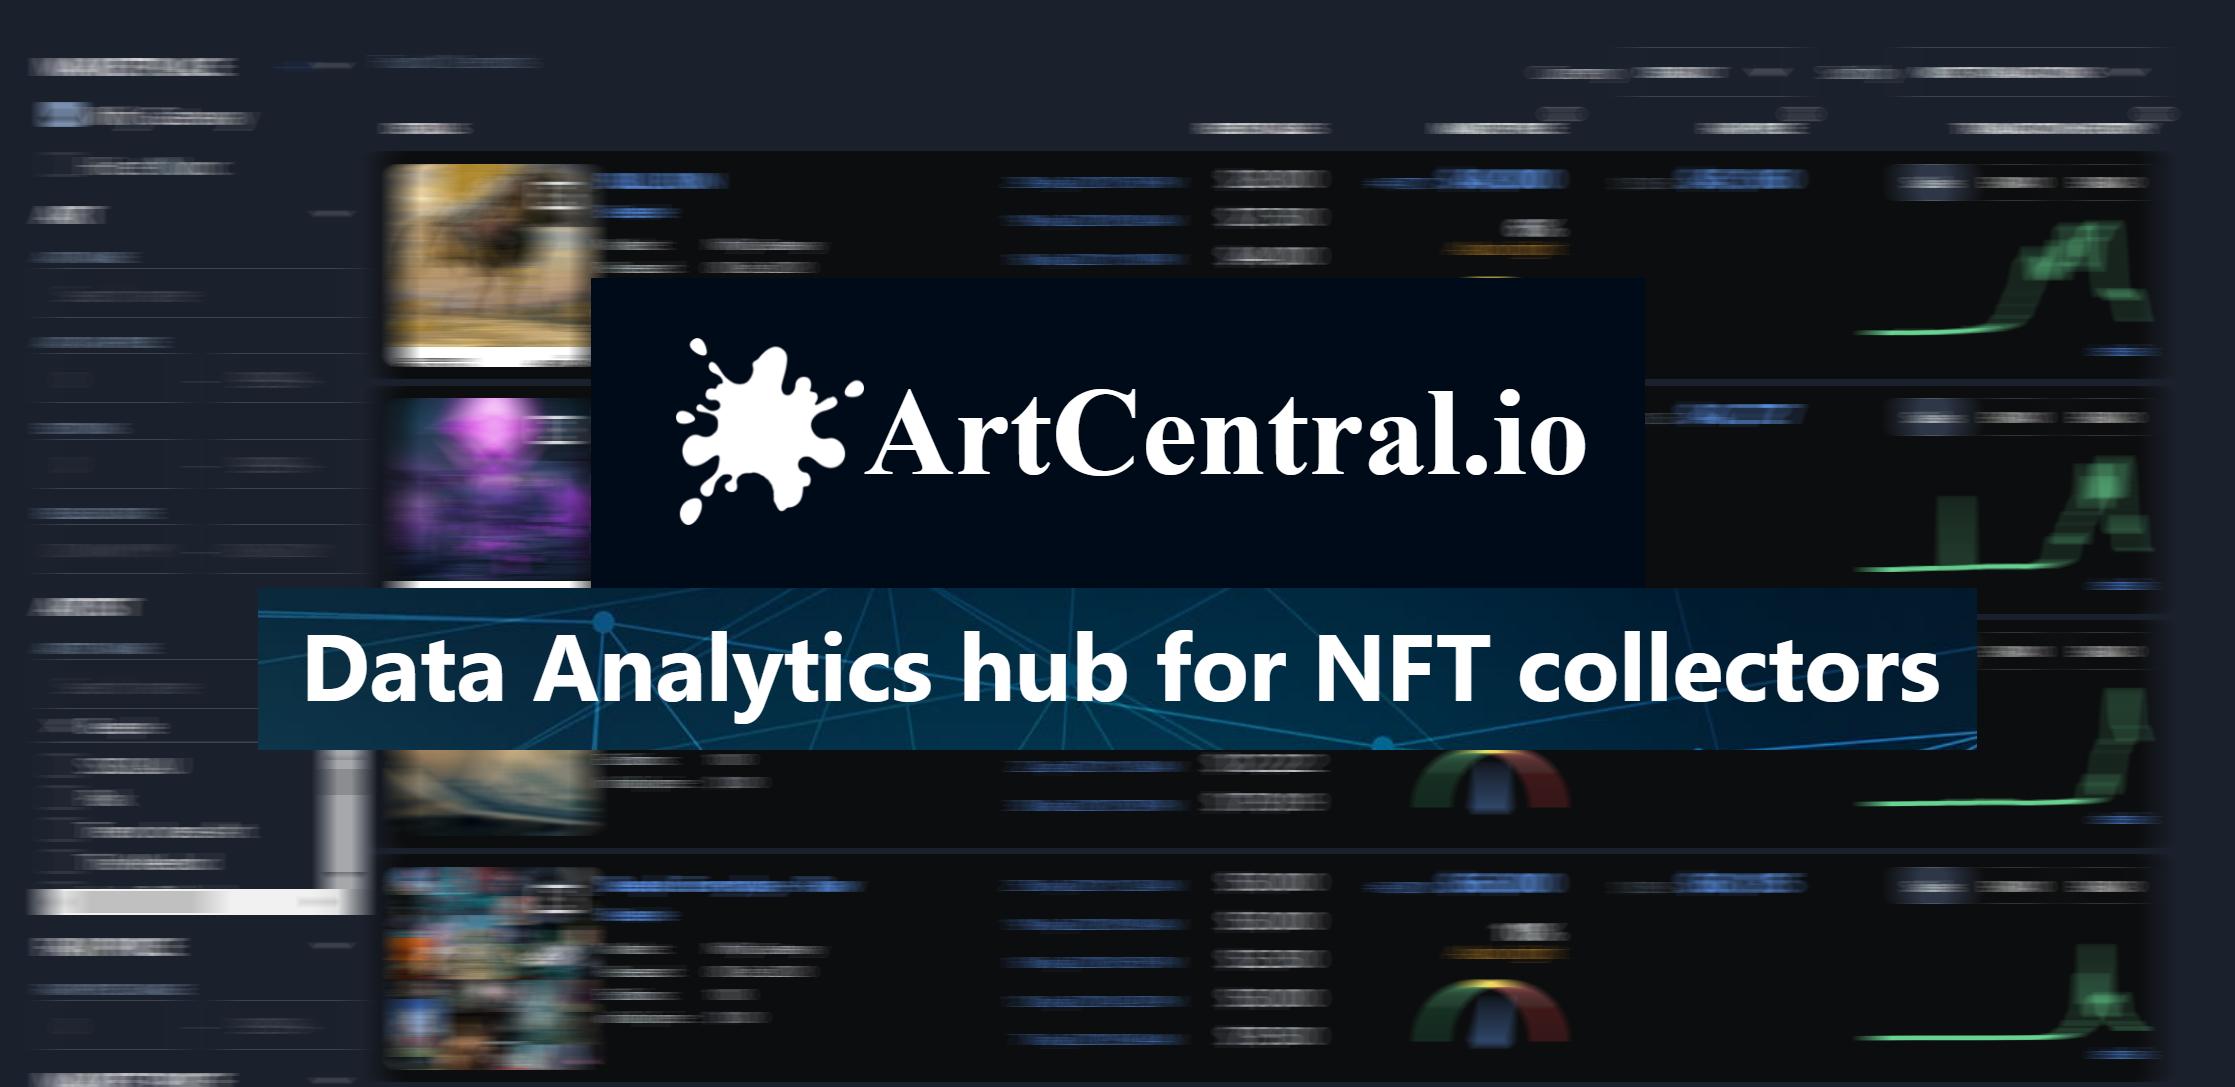 artcentral_header2